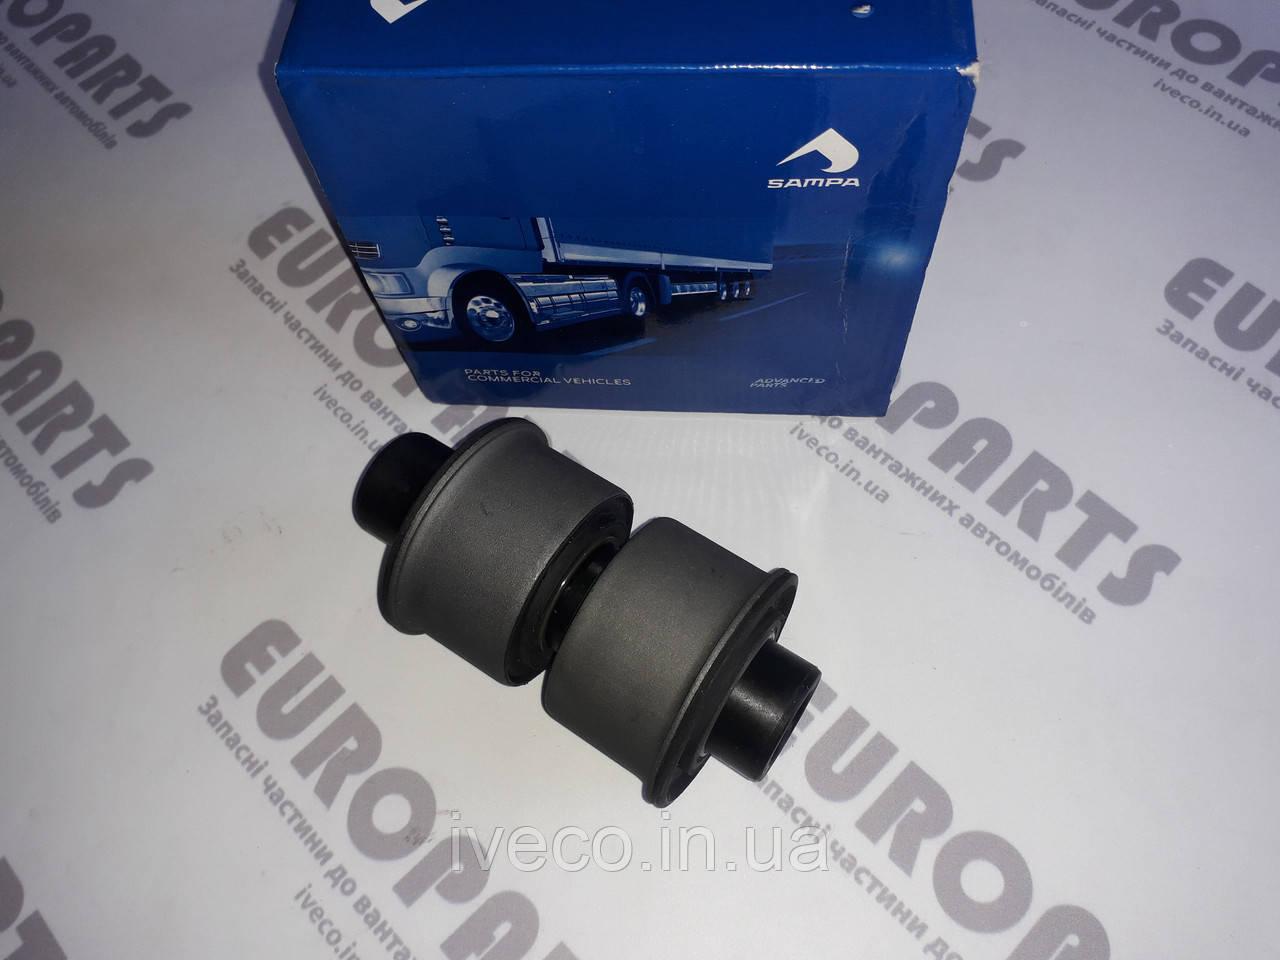 Ремкомплект підвіски кабіни Iveco Trakker Eurotrakker Stralis Івеко 500357265 504021532 втулки + палець